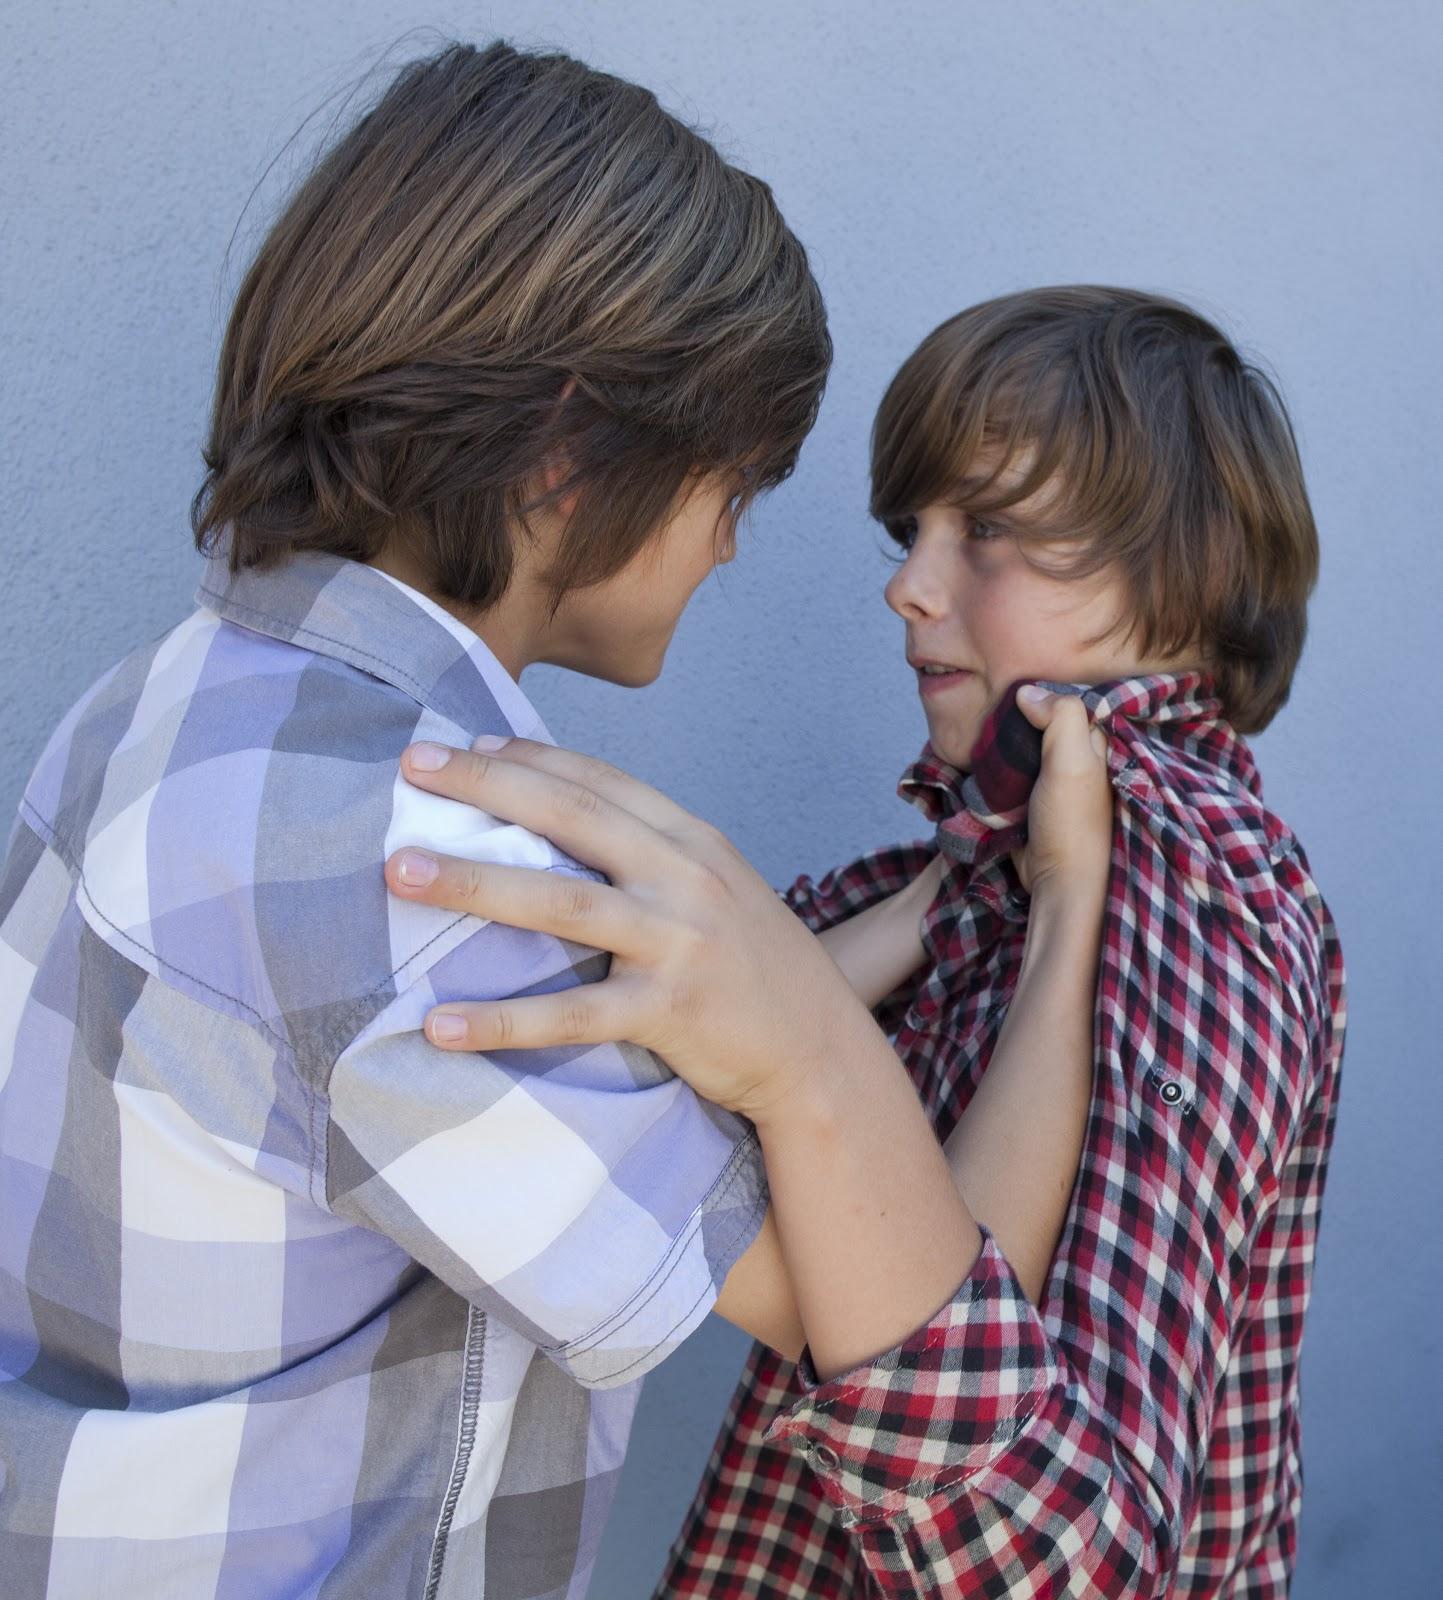 Little kids fighting at school